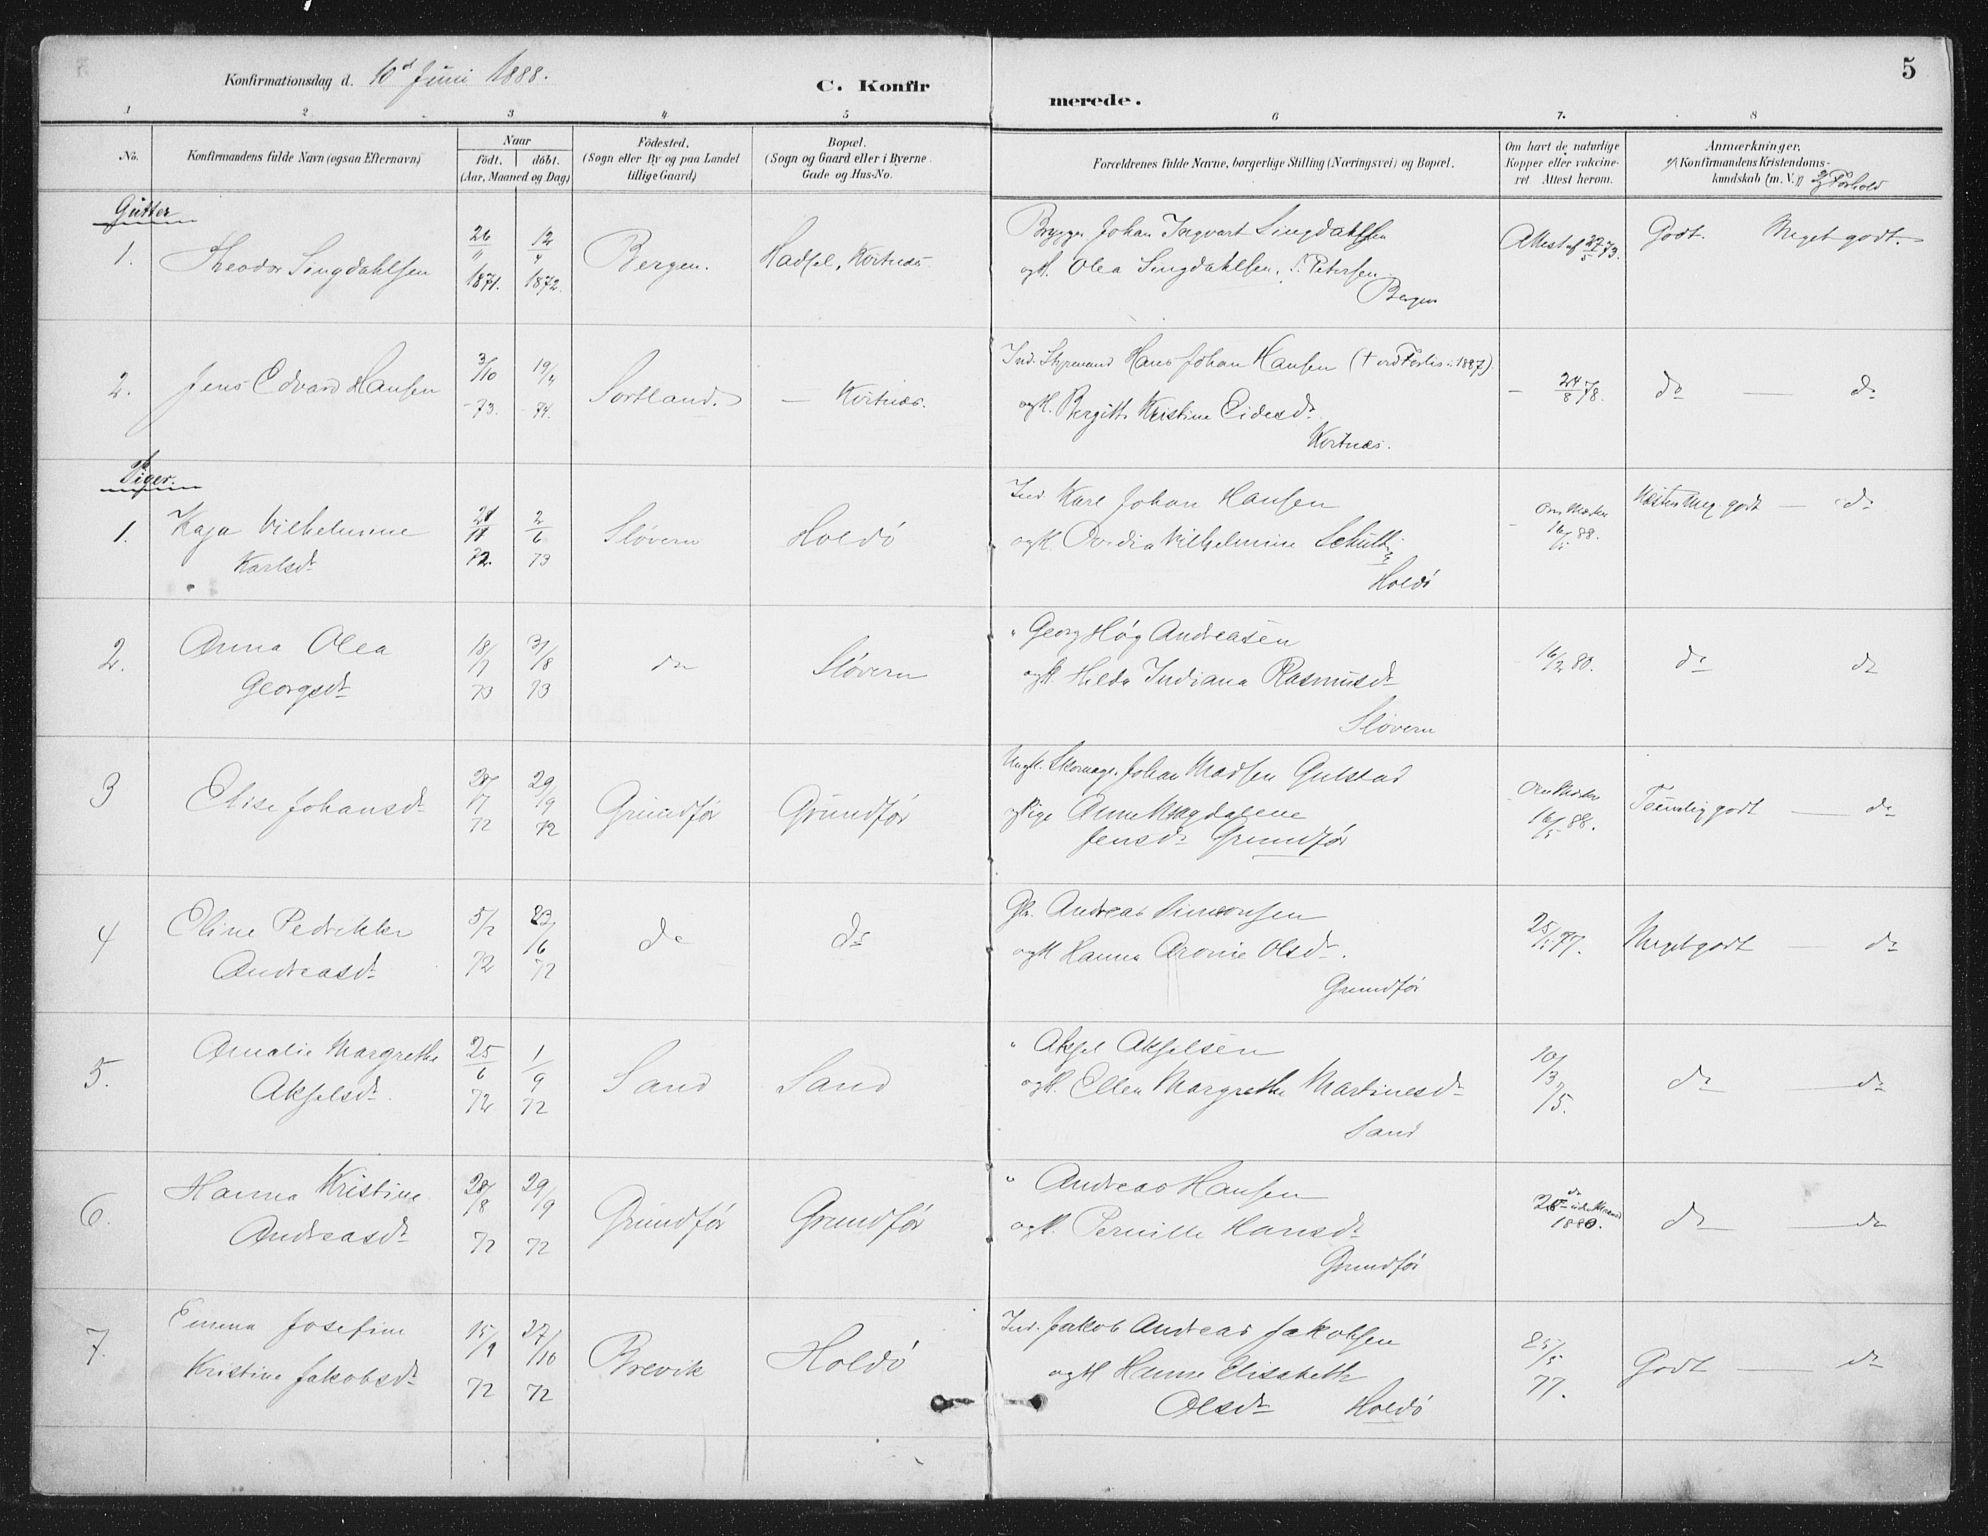 SAT, Ministerialprotokoller, klokkerbøker og fødselsregistre - Nordland, 888/L1245: Ministerialbok nr. 888A11, 1888-1900, s. 5